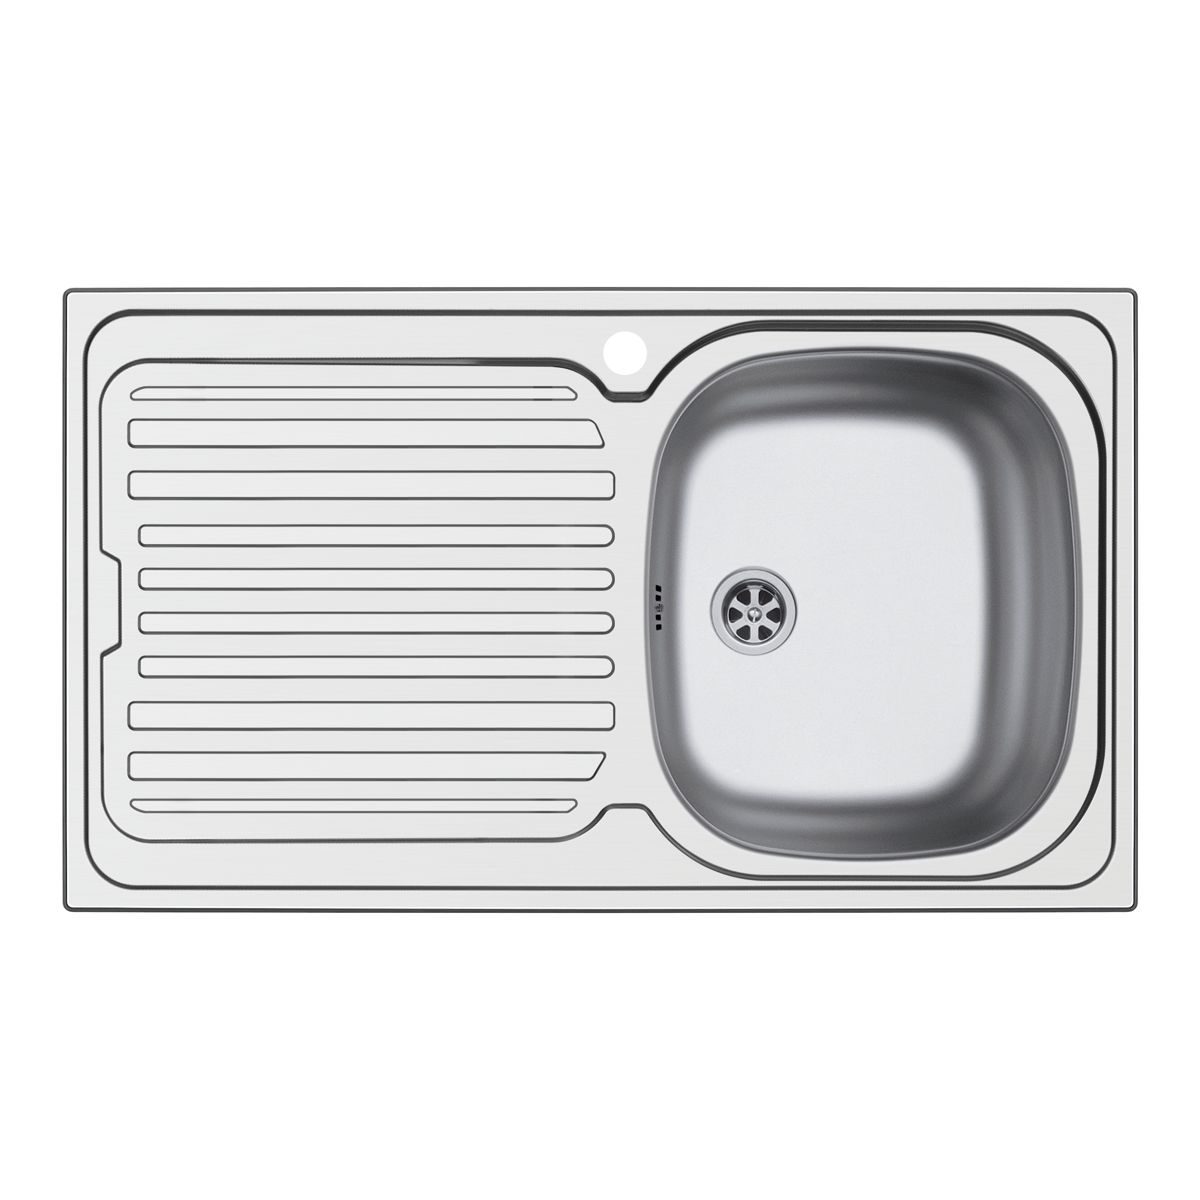 Vendita lavandini cucina excellent lavabo da cucina in - Mobile lavello cucina leroy merlin ...